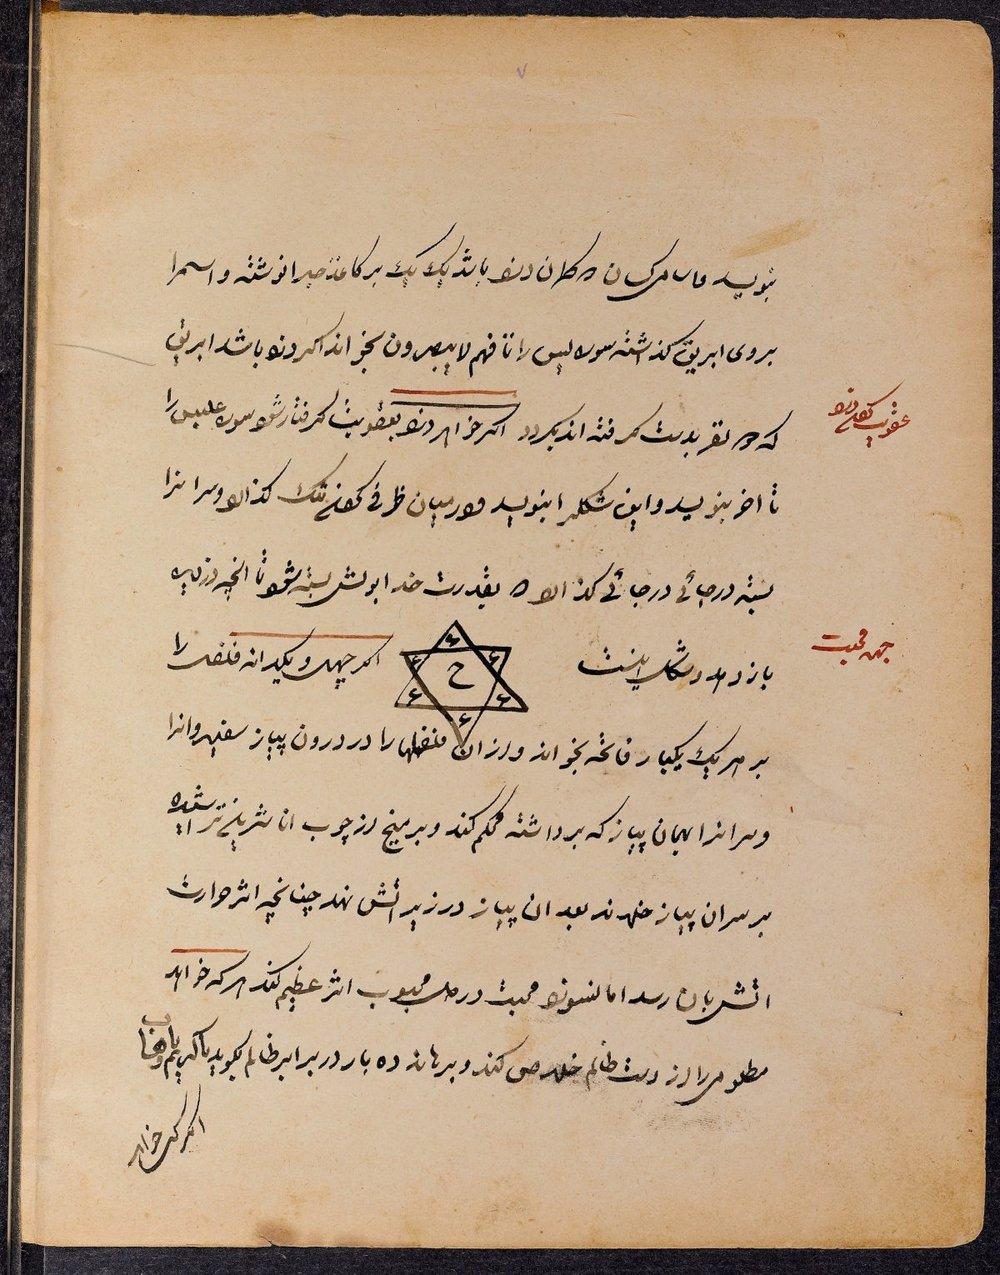 Demons-iran-24-1200x1530.jpg